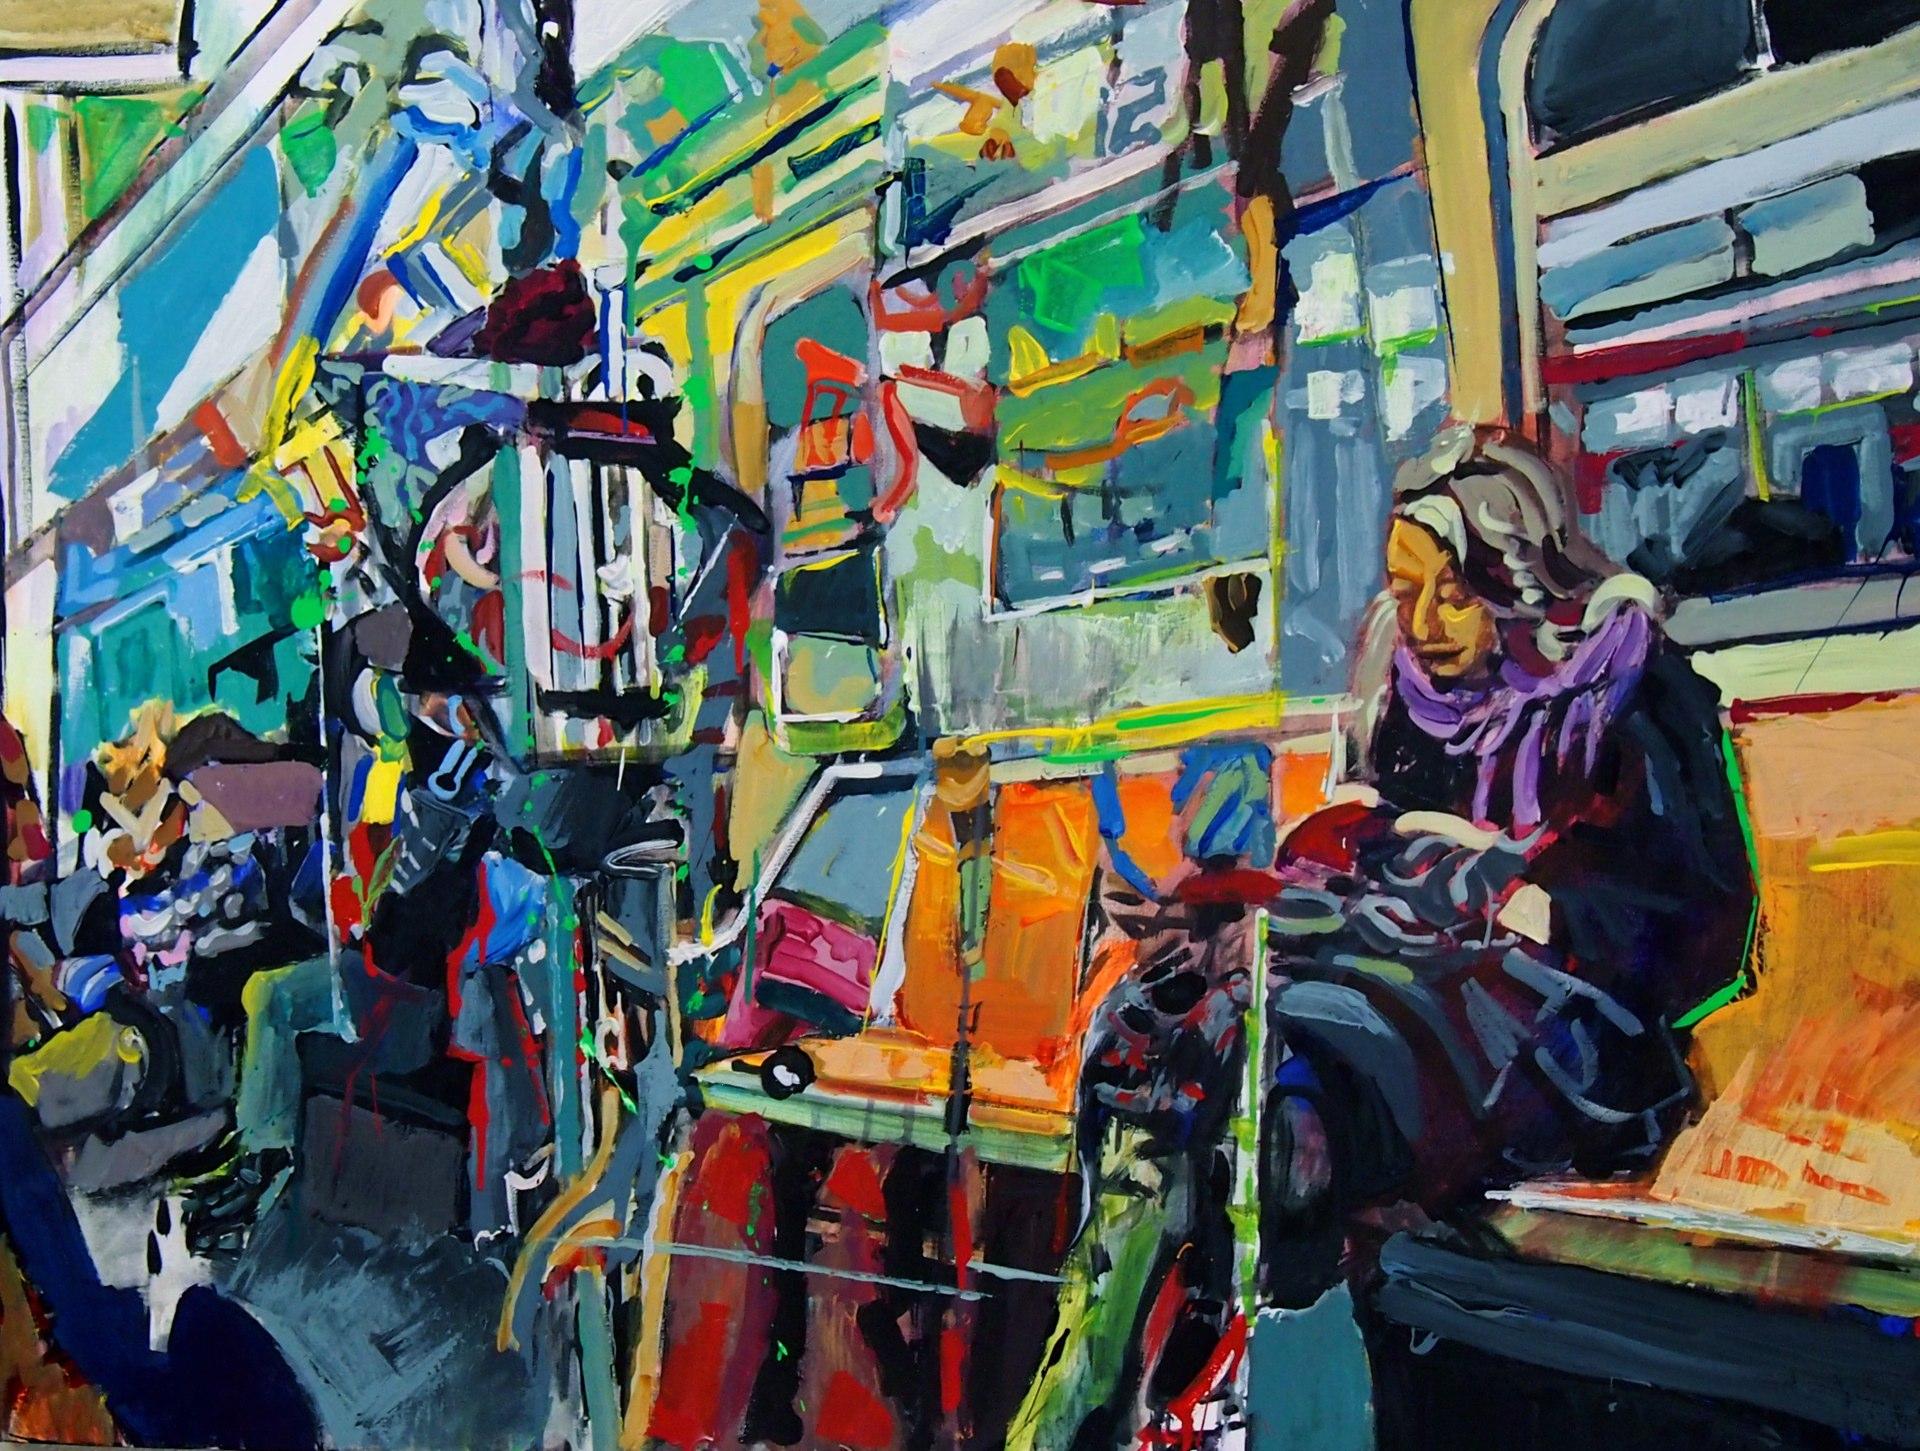 subway_gal_amxkex15